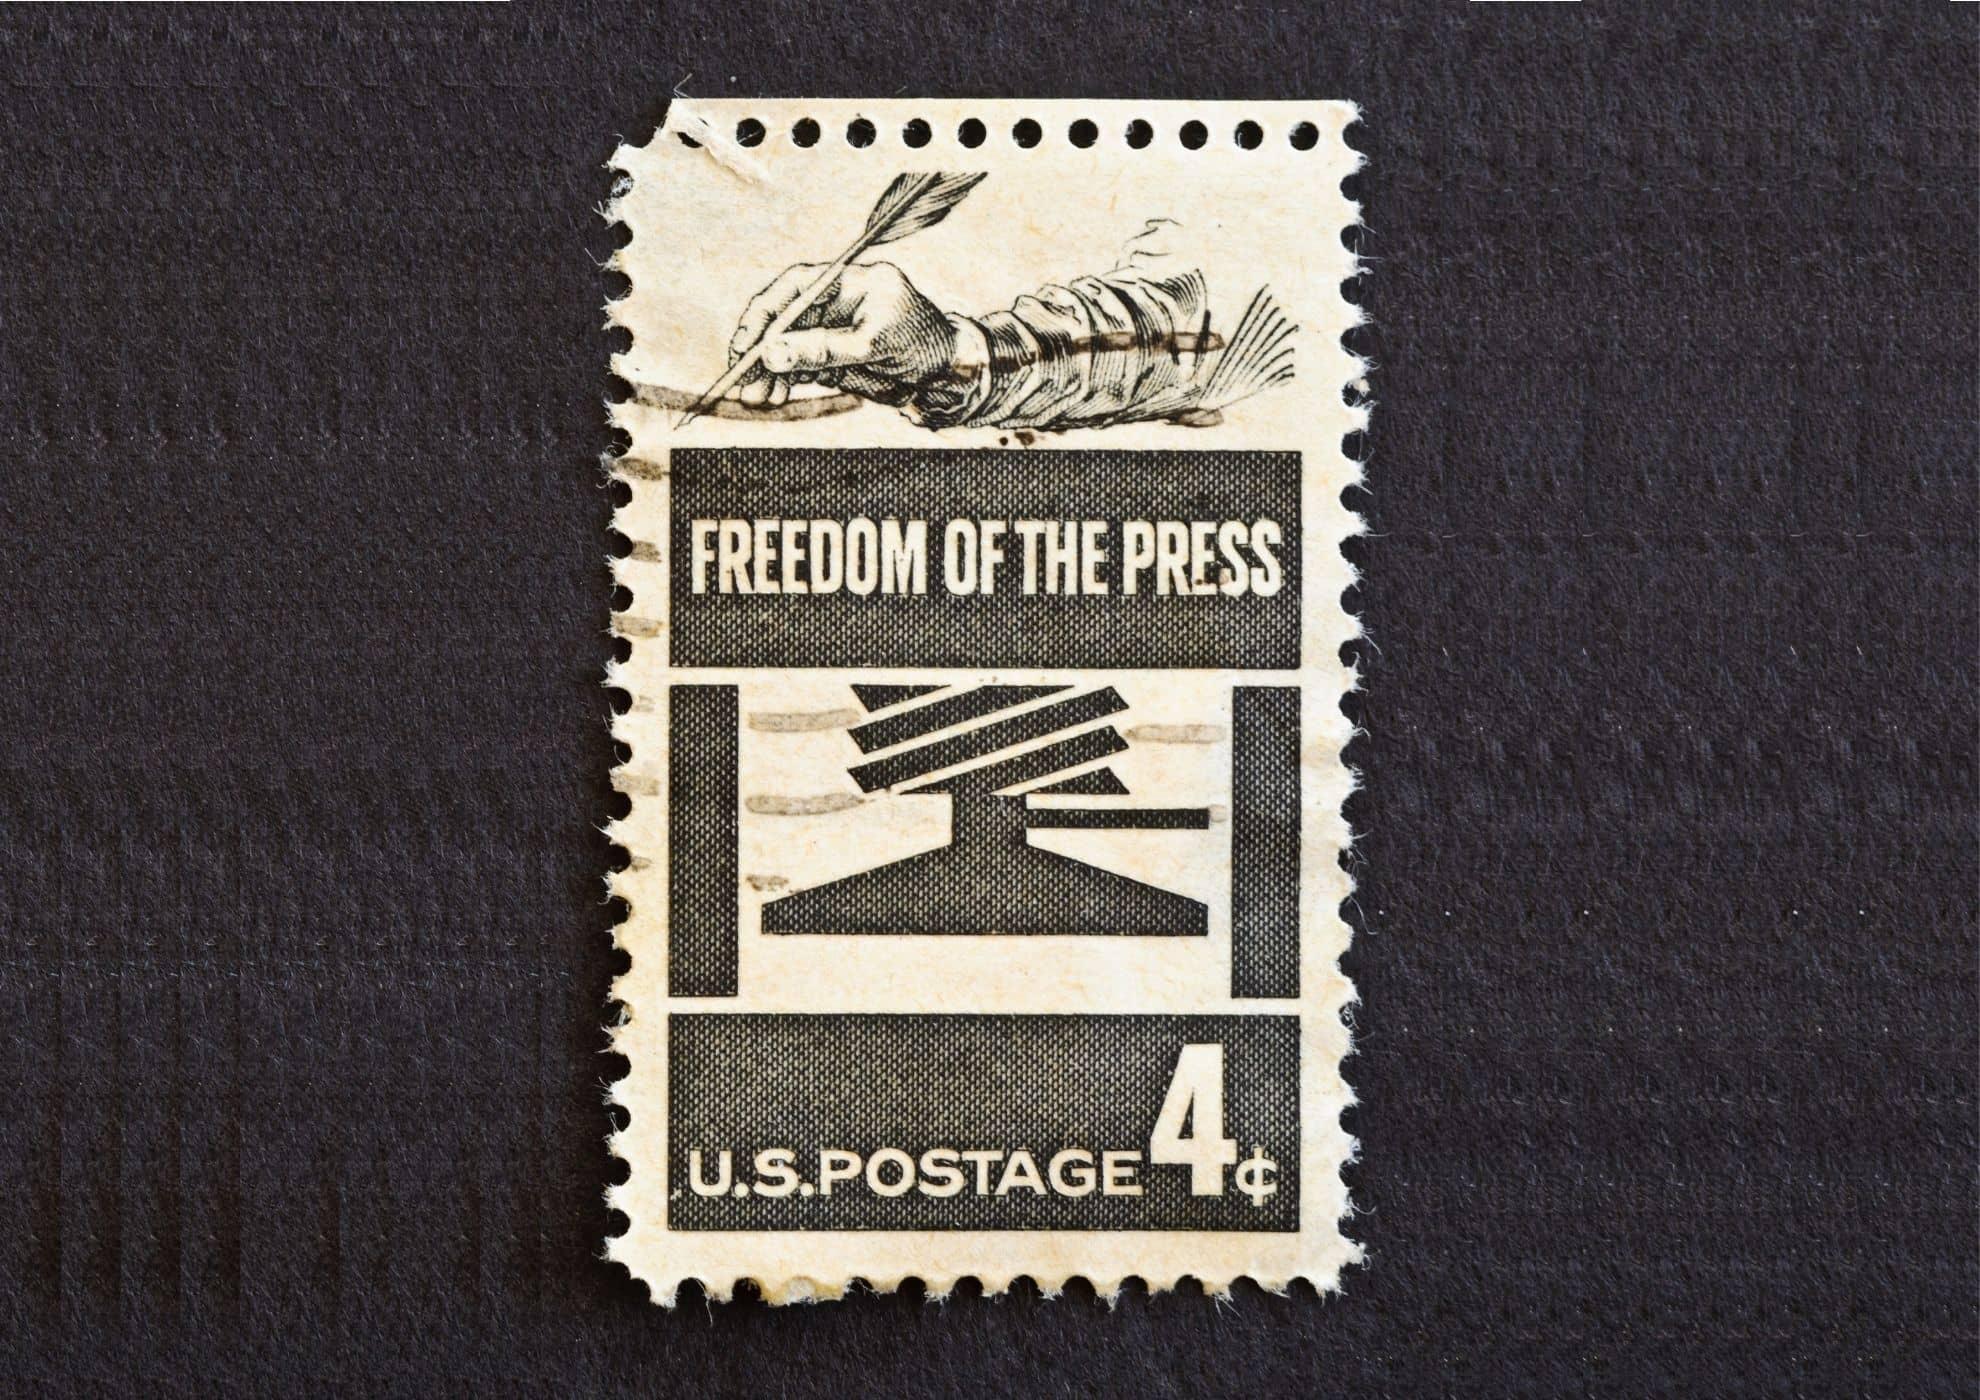 freedomofthepress.featured image (1)